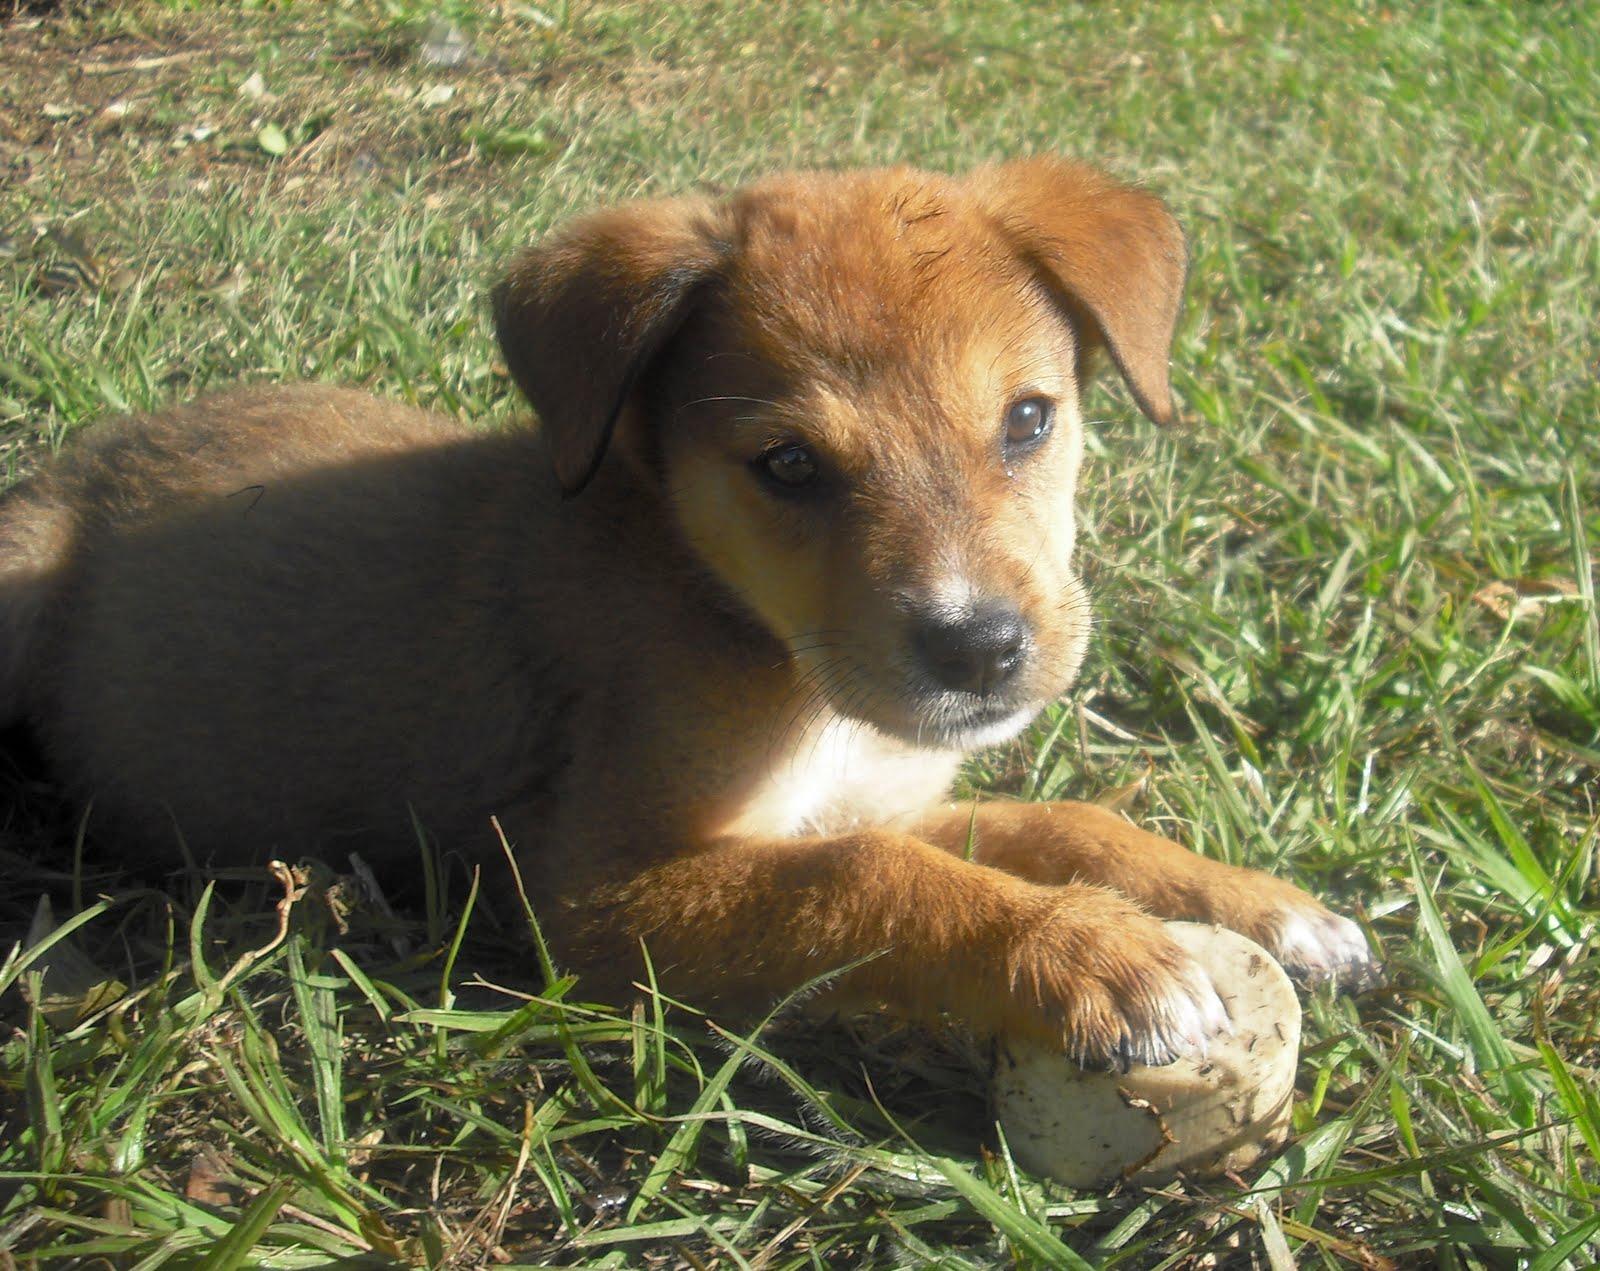 Half Pitbull Half German Shepherd Puppies | Dog Breeds Picture